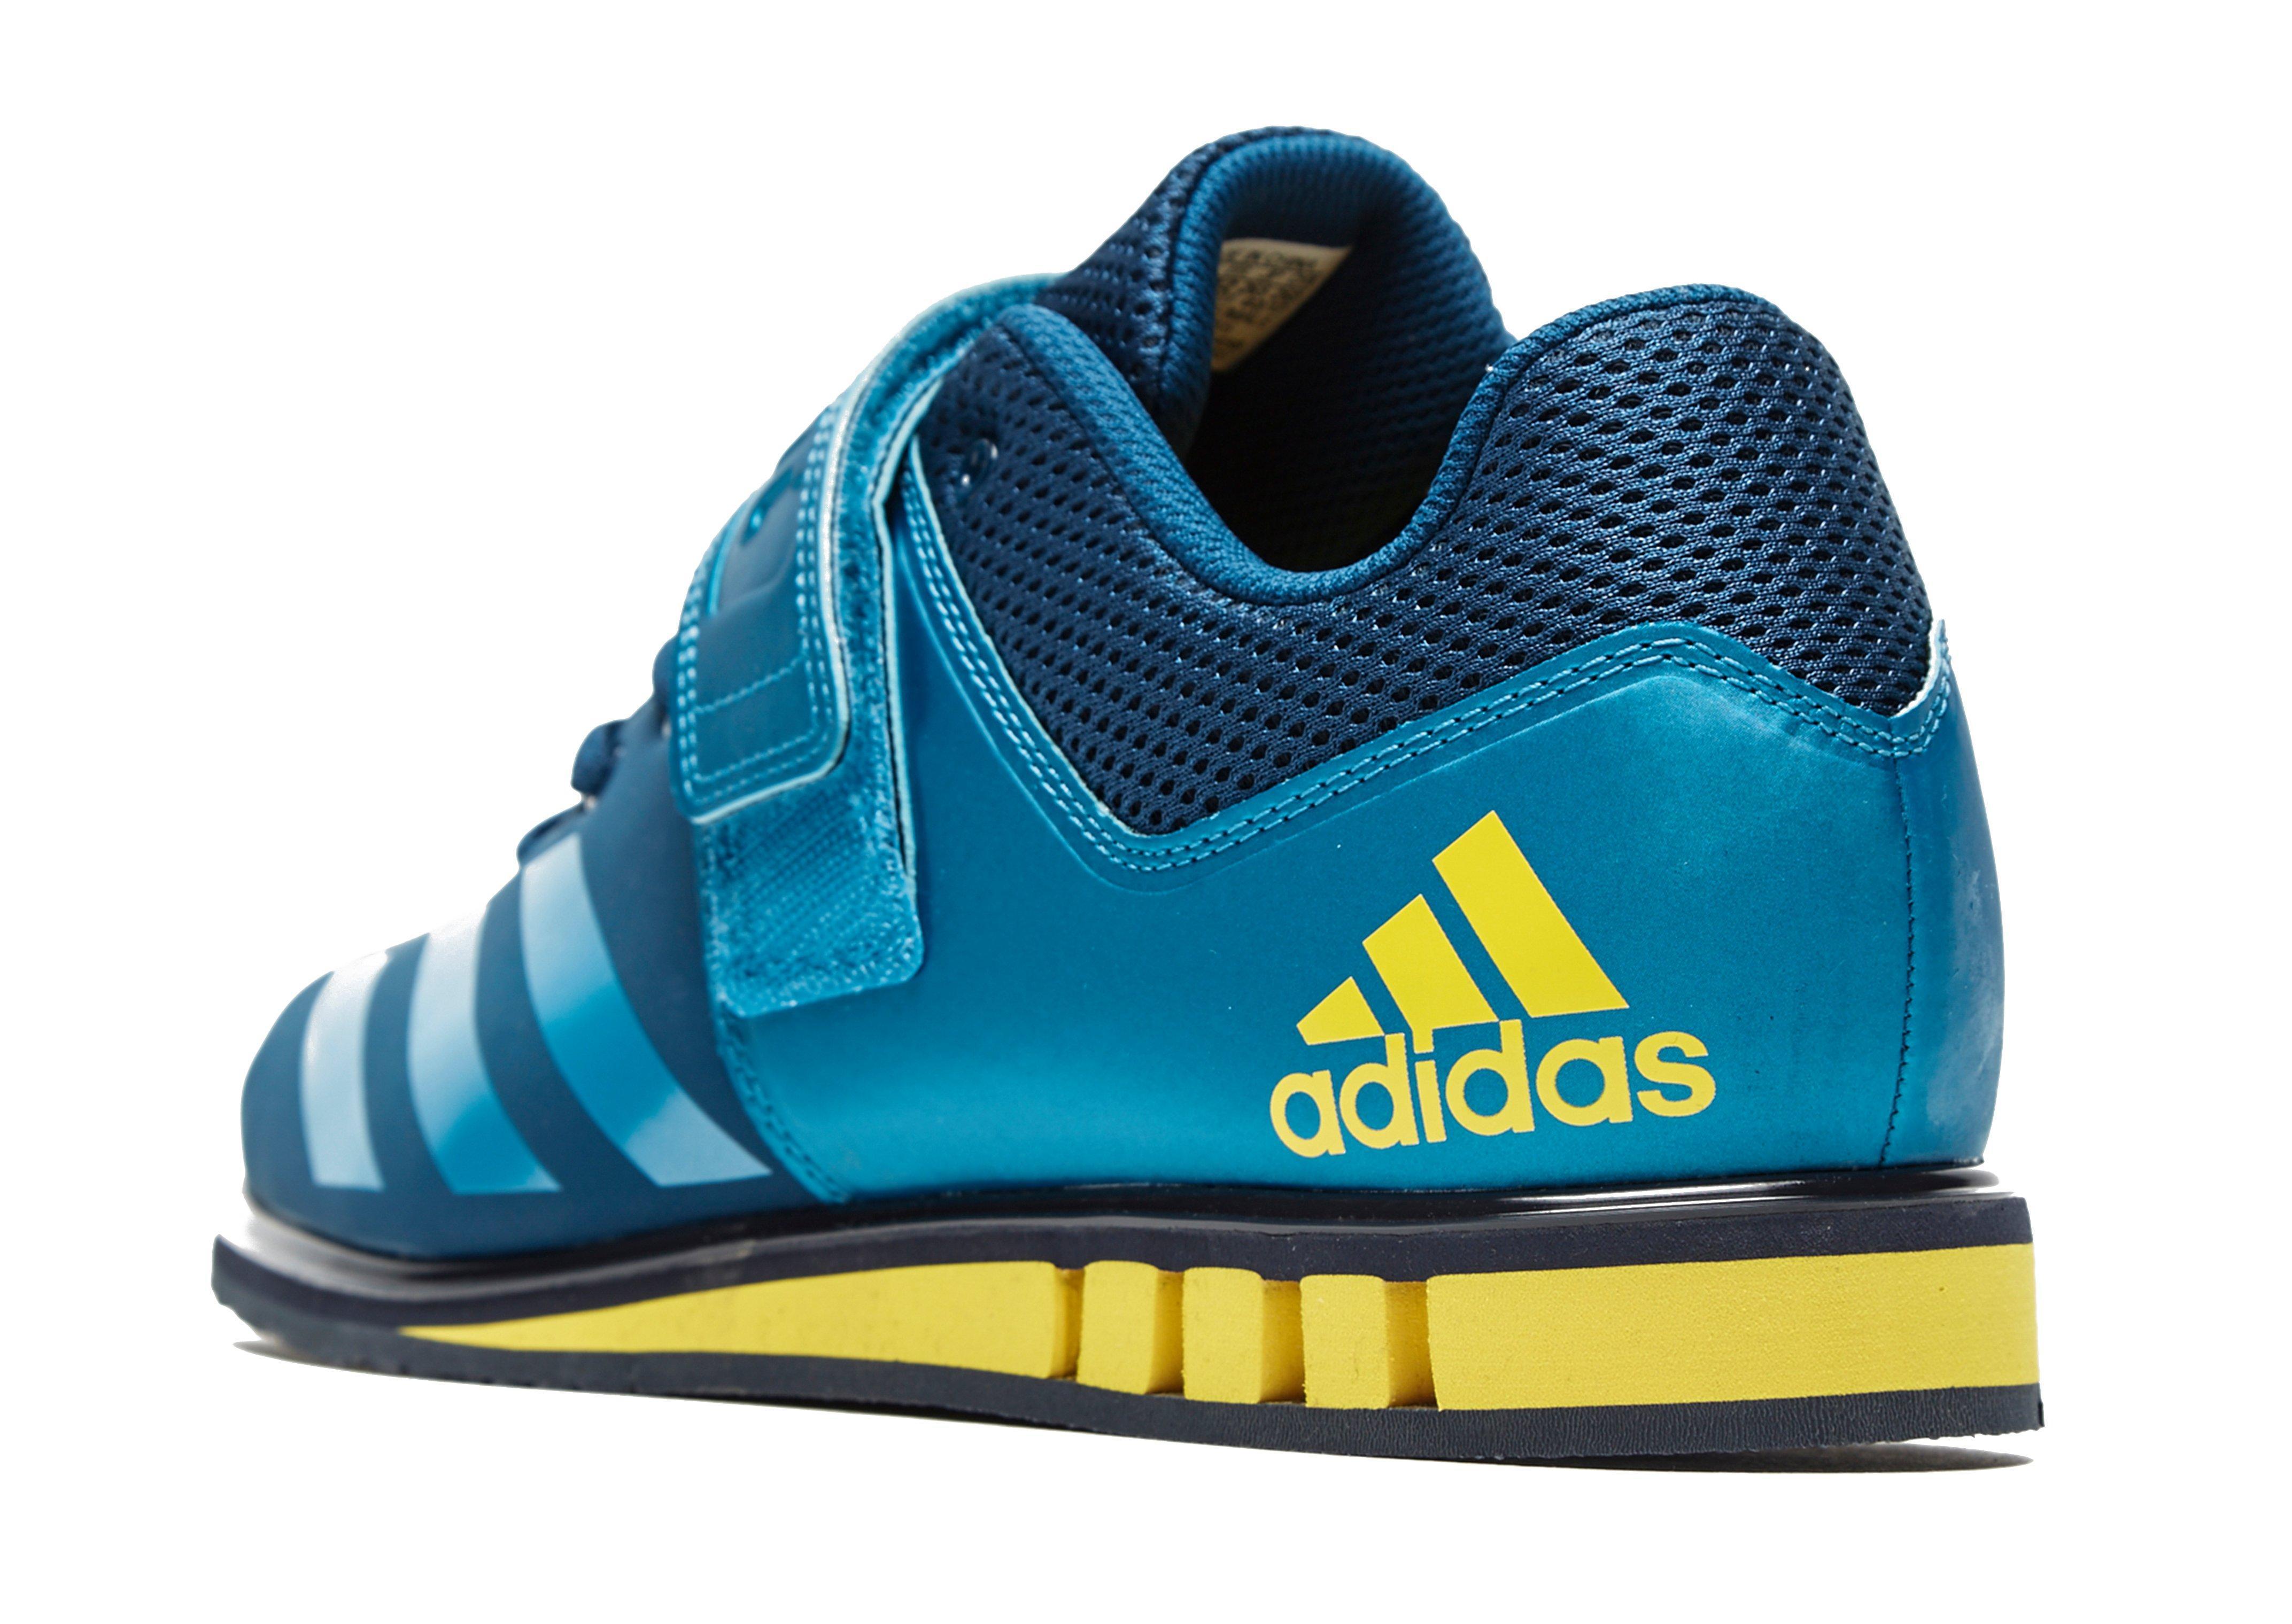 adidas Synthetic Powerlift 3.1